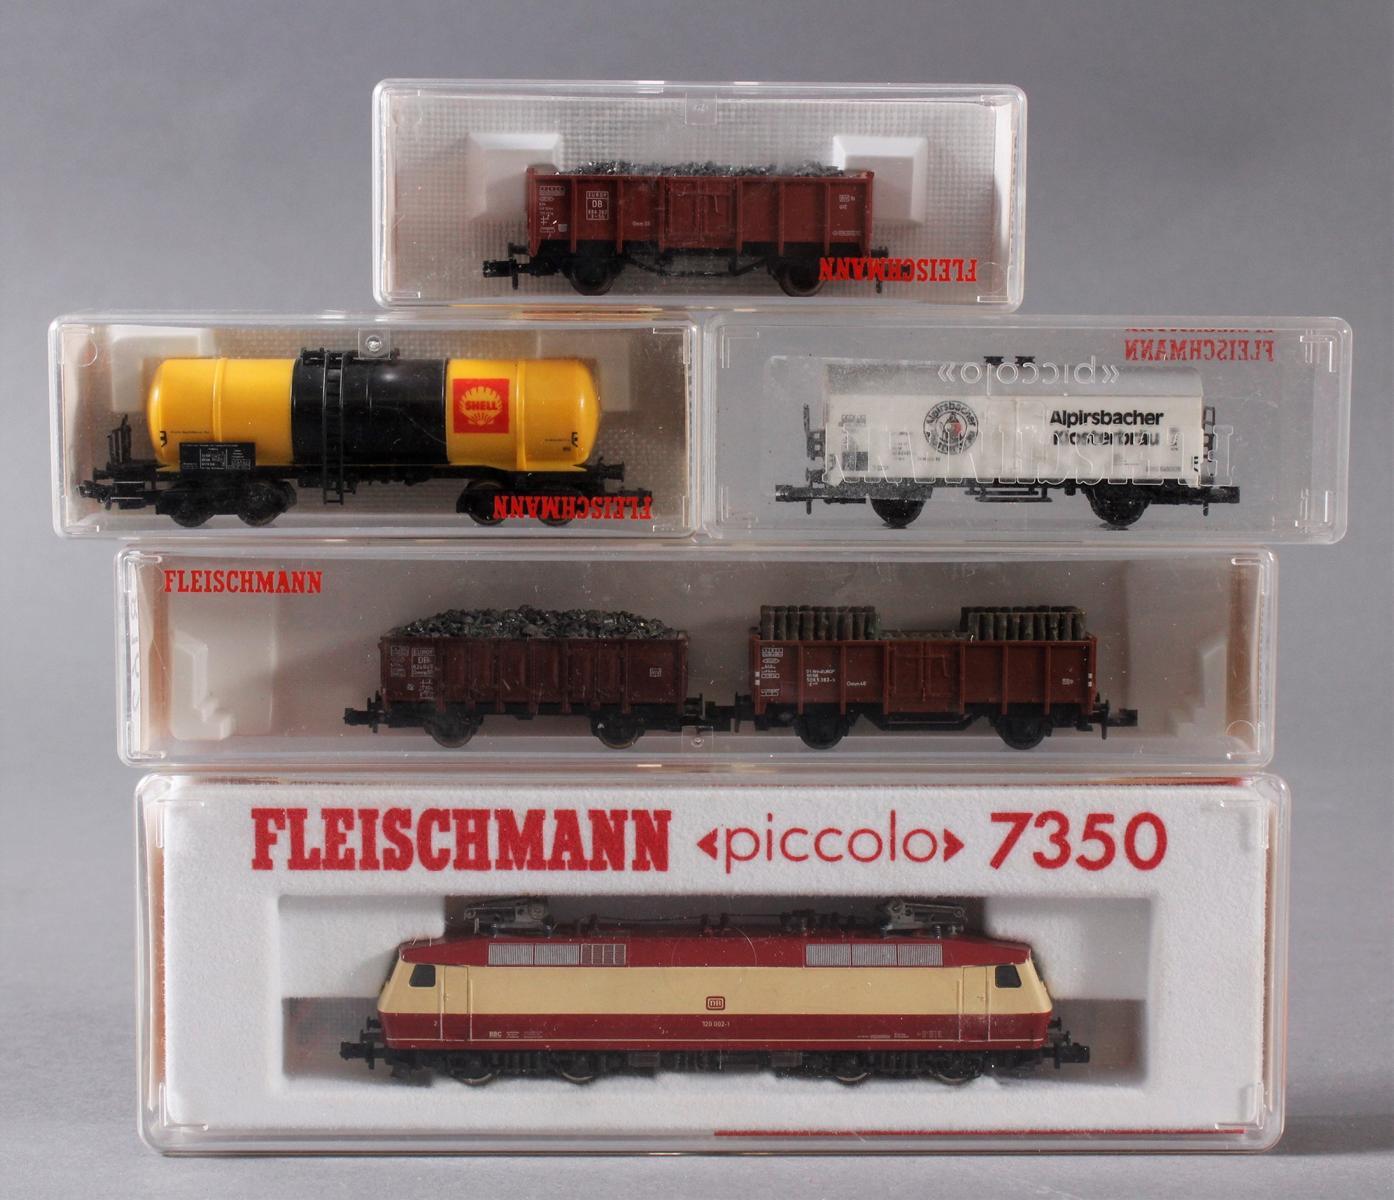 Fleischmann E-Lok 7350 mit 5 Güterwaggons